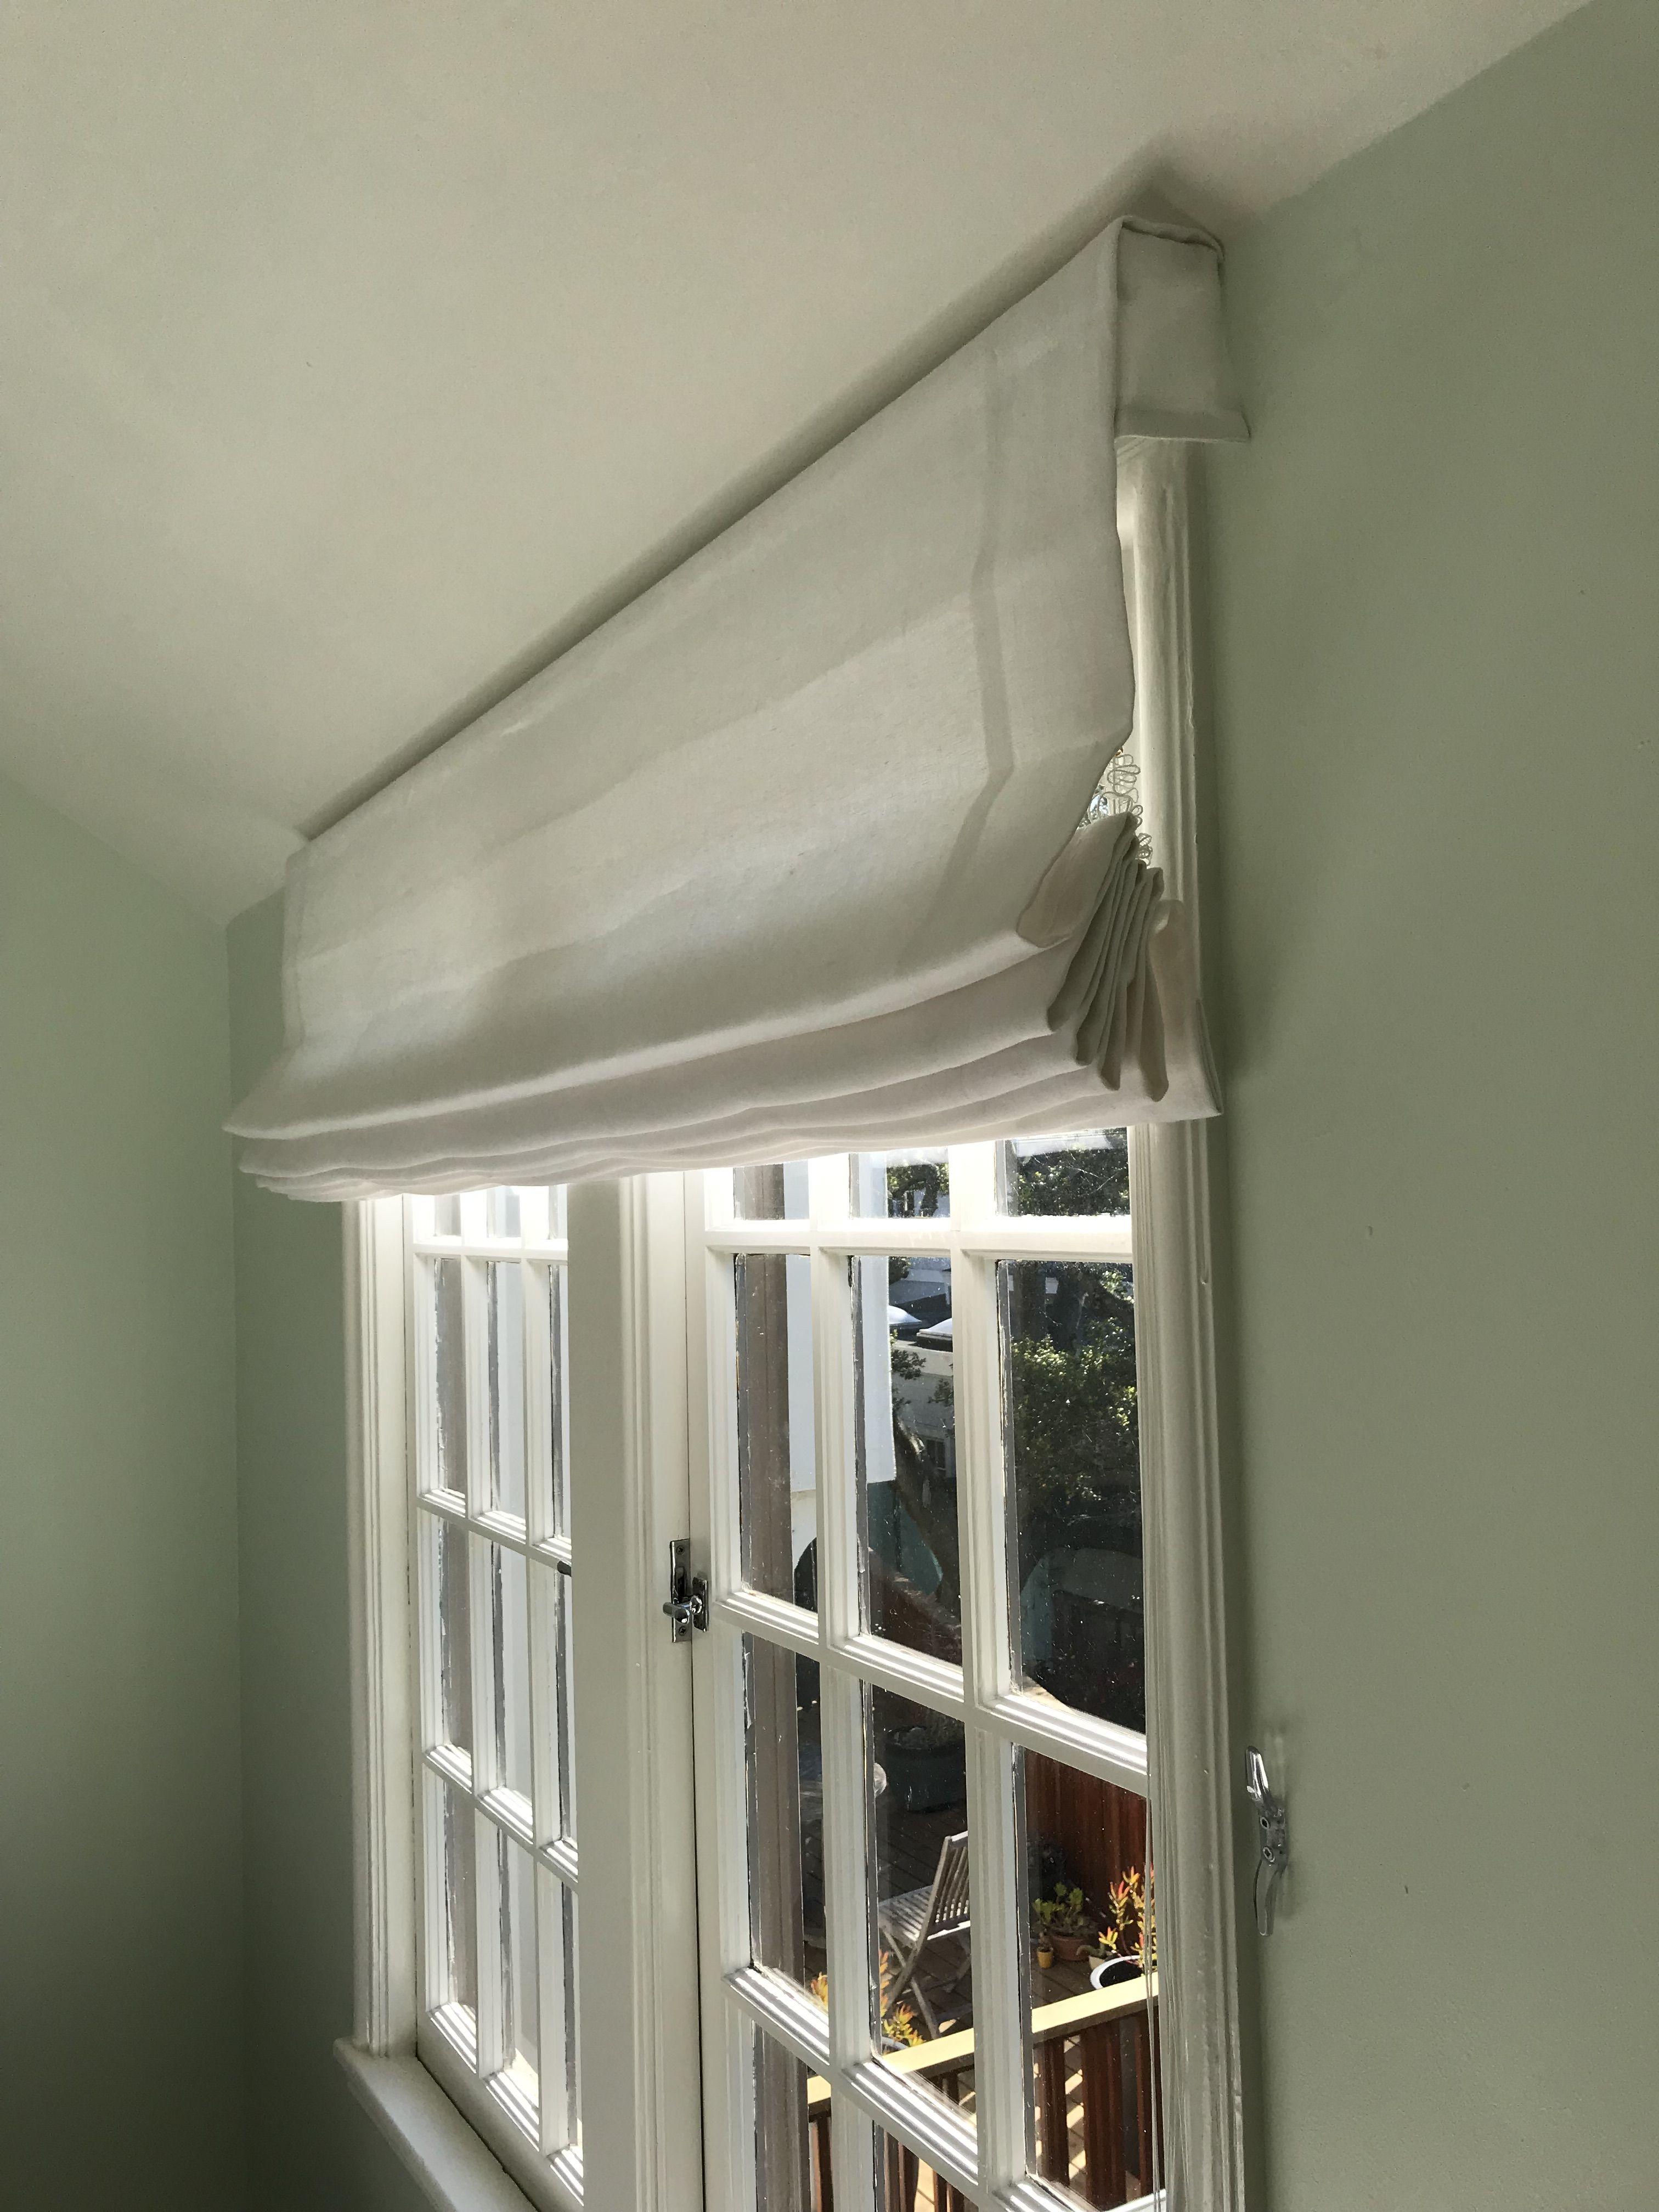 Roman Shades For Cozy Bedroom Window Shades Bedroom Roman Shades Bedroom Living Room Blinds